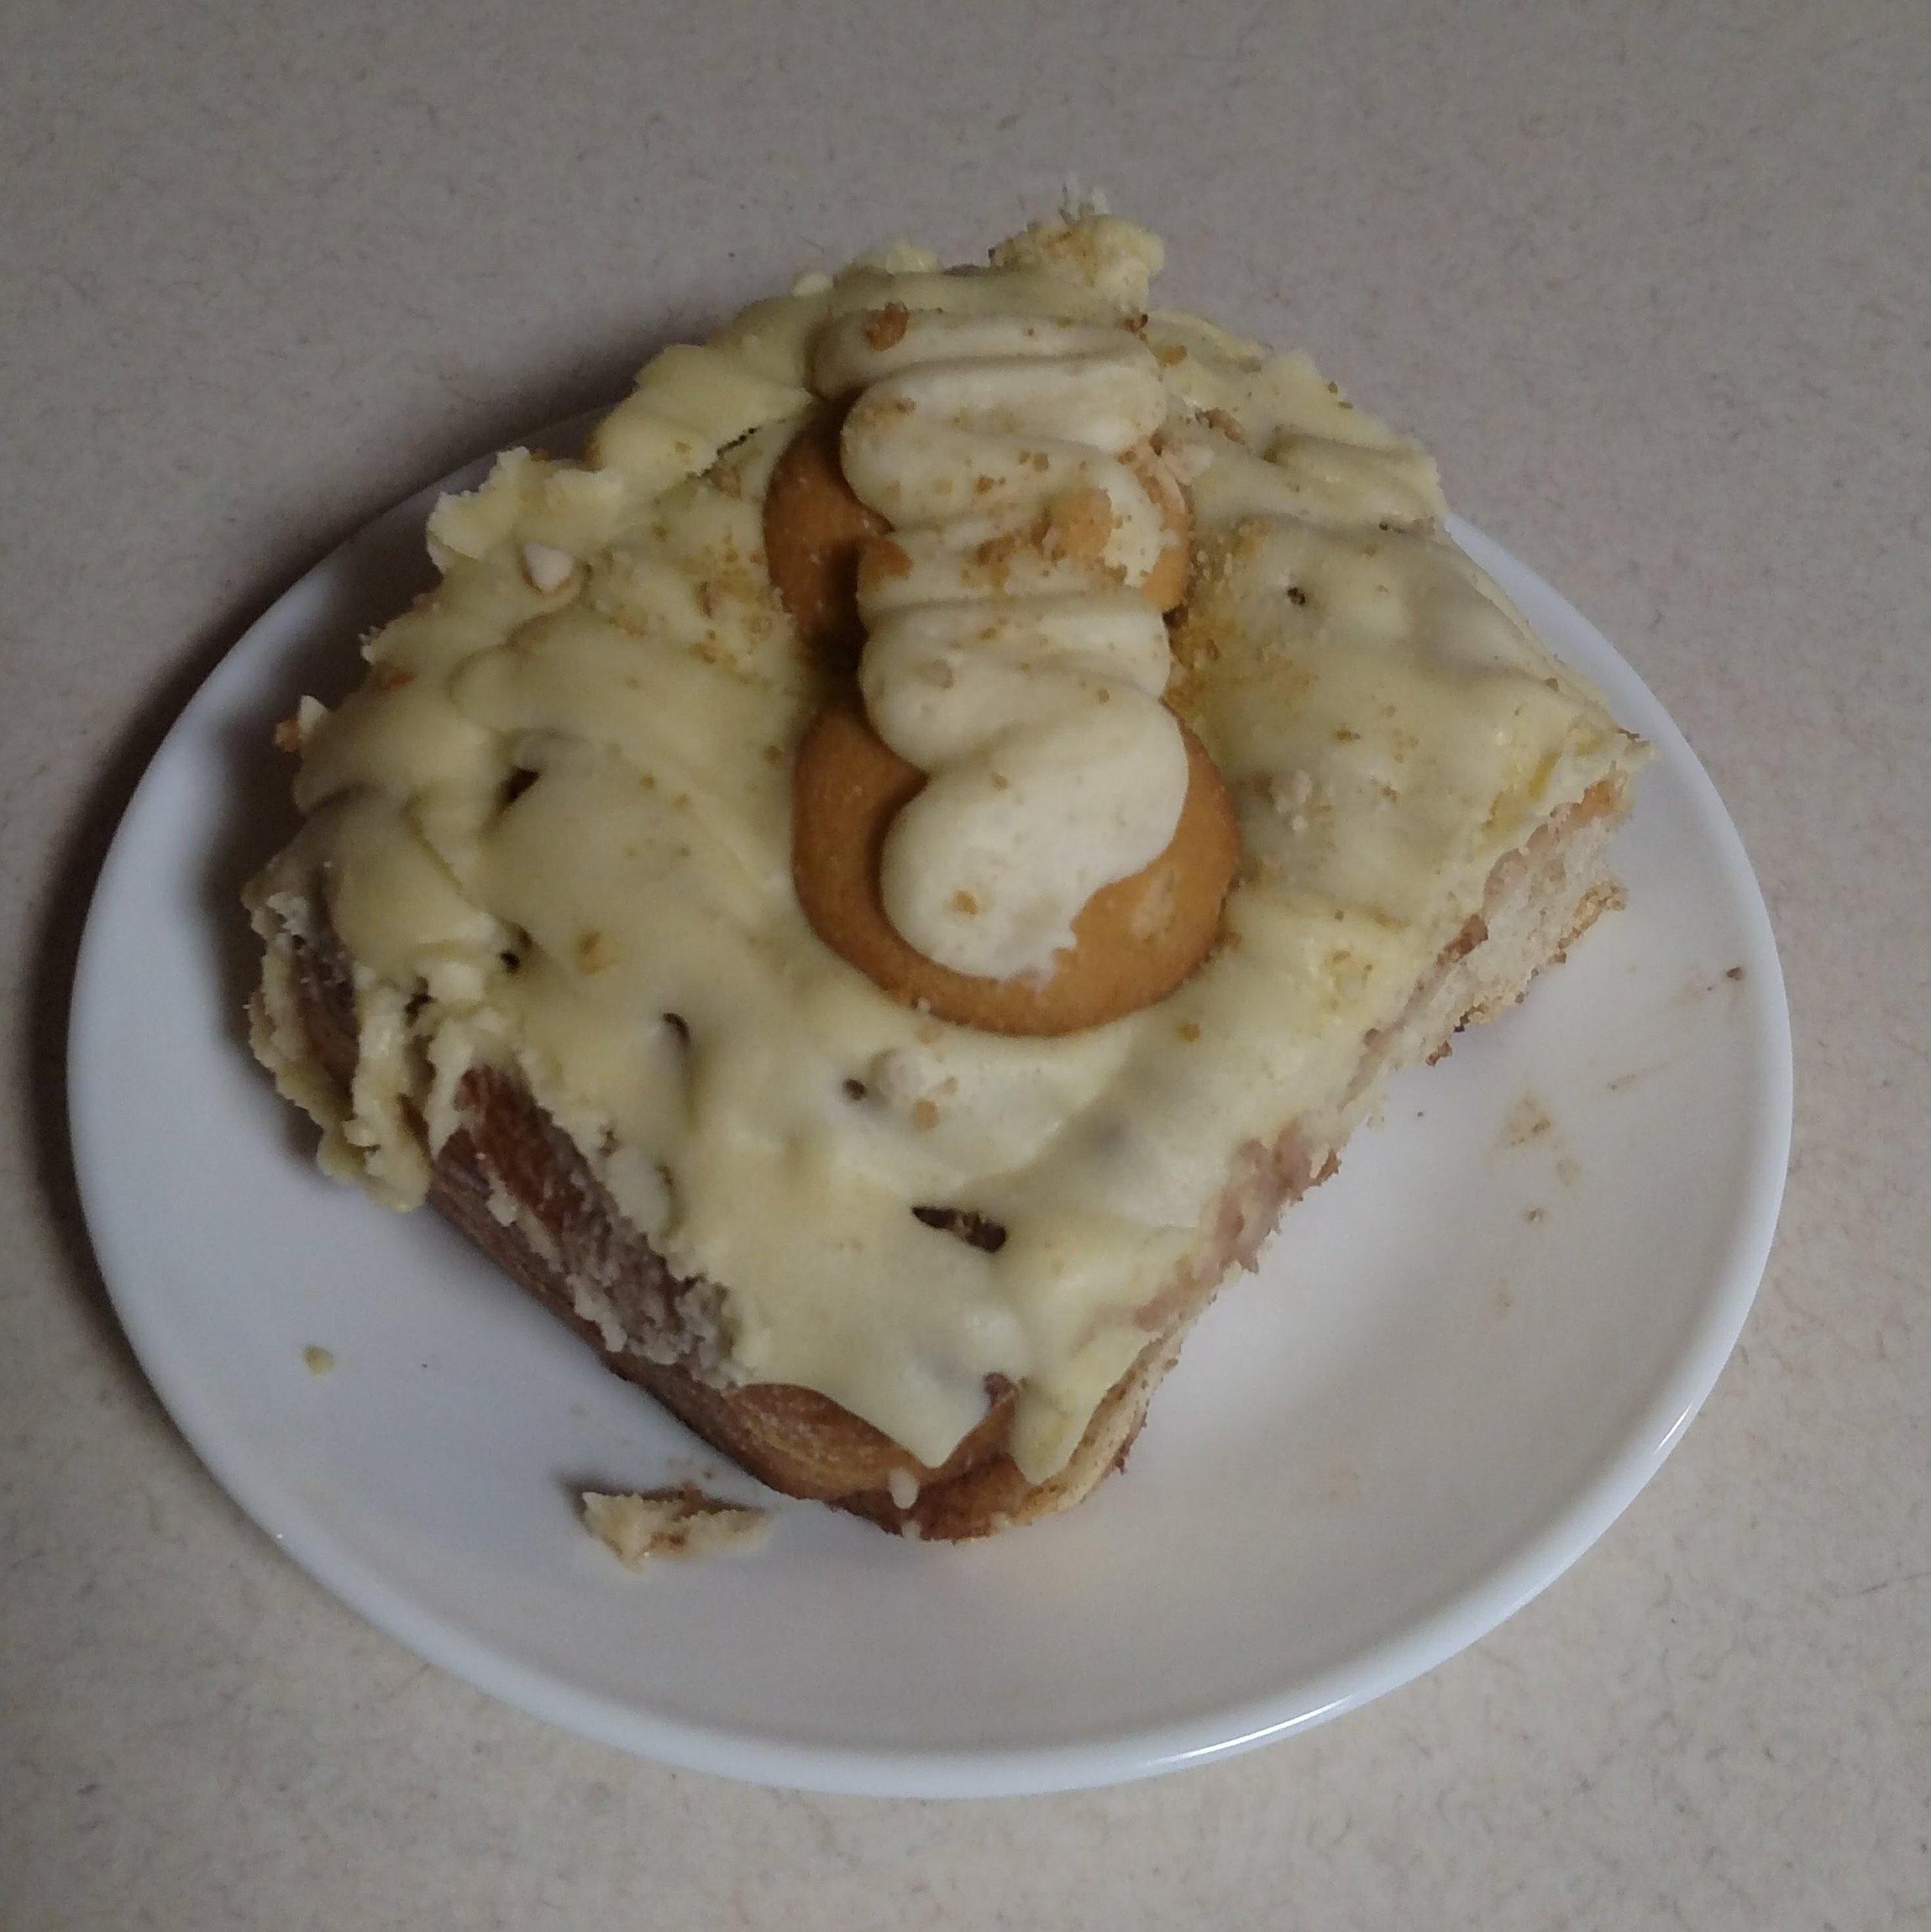 Banana pudding Cinnamom Grand Blanc, MI